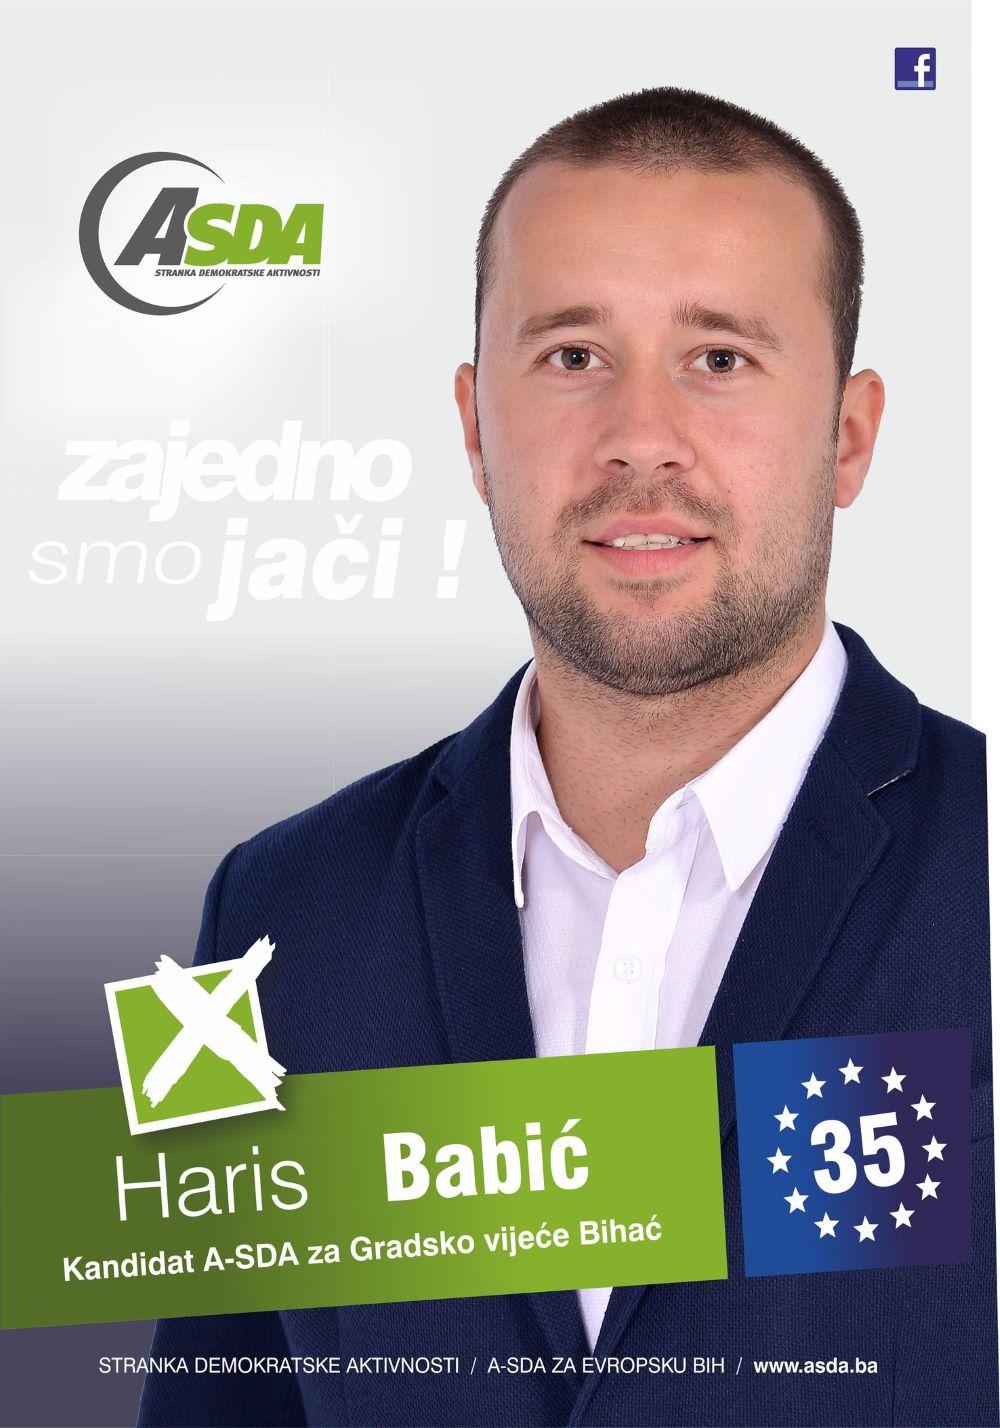 Haris Babić